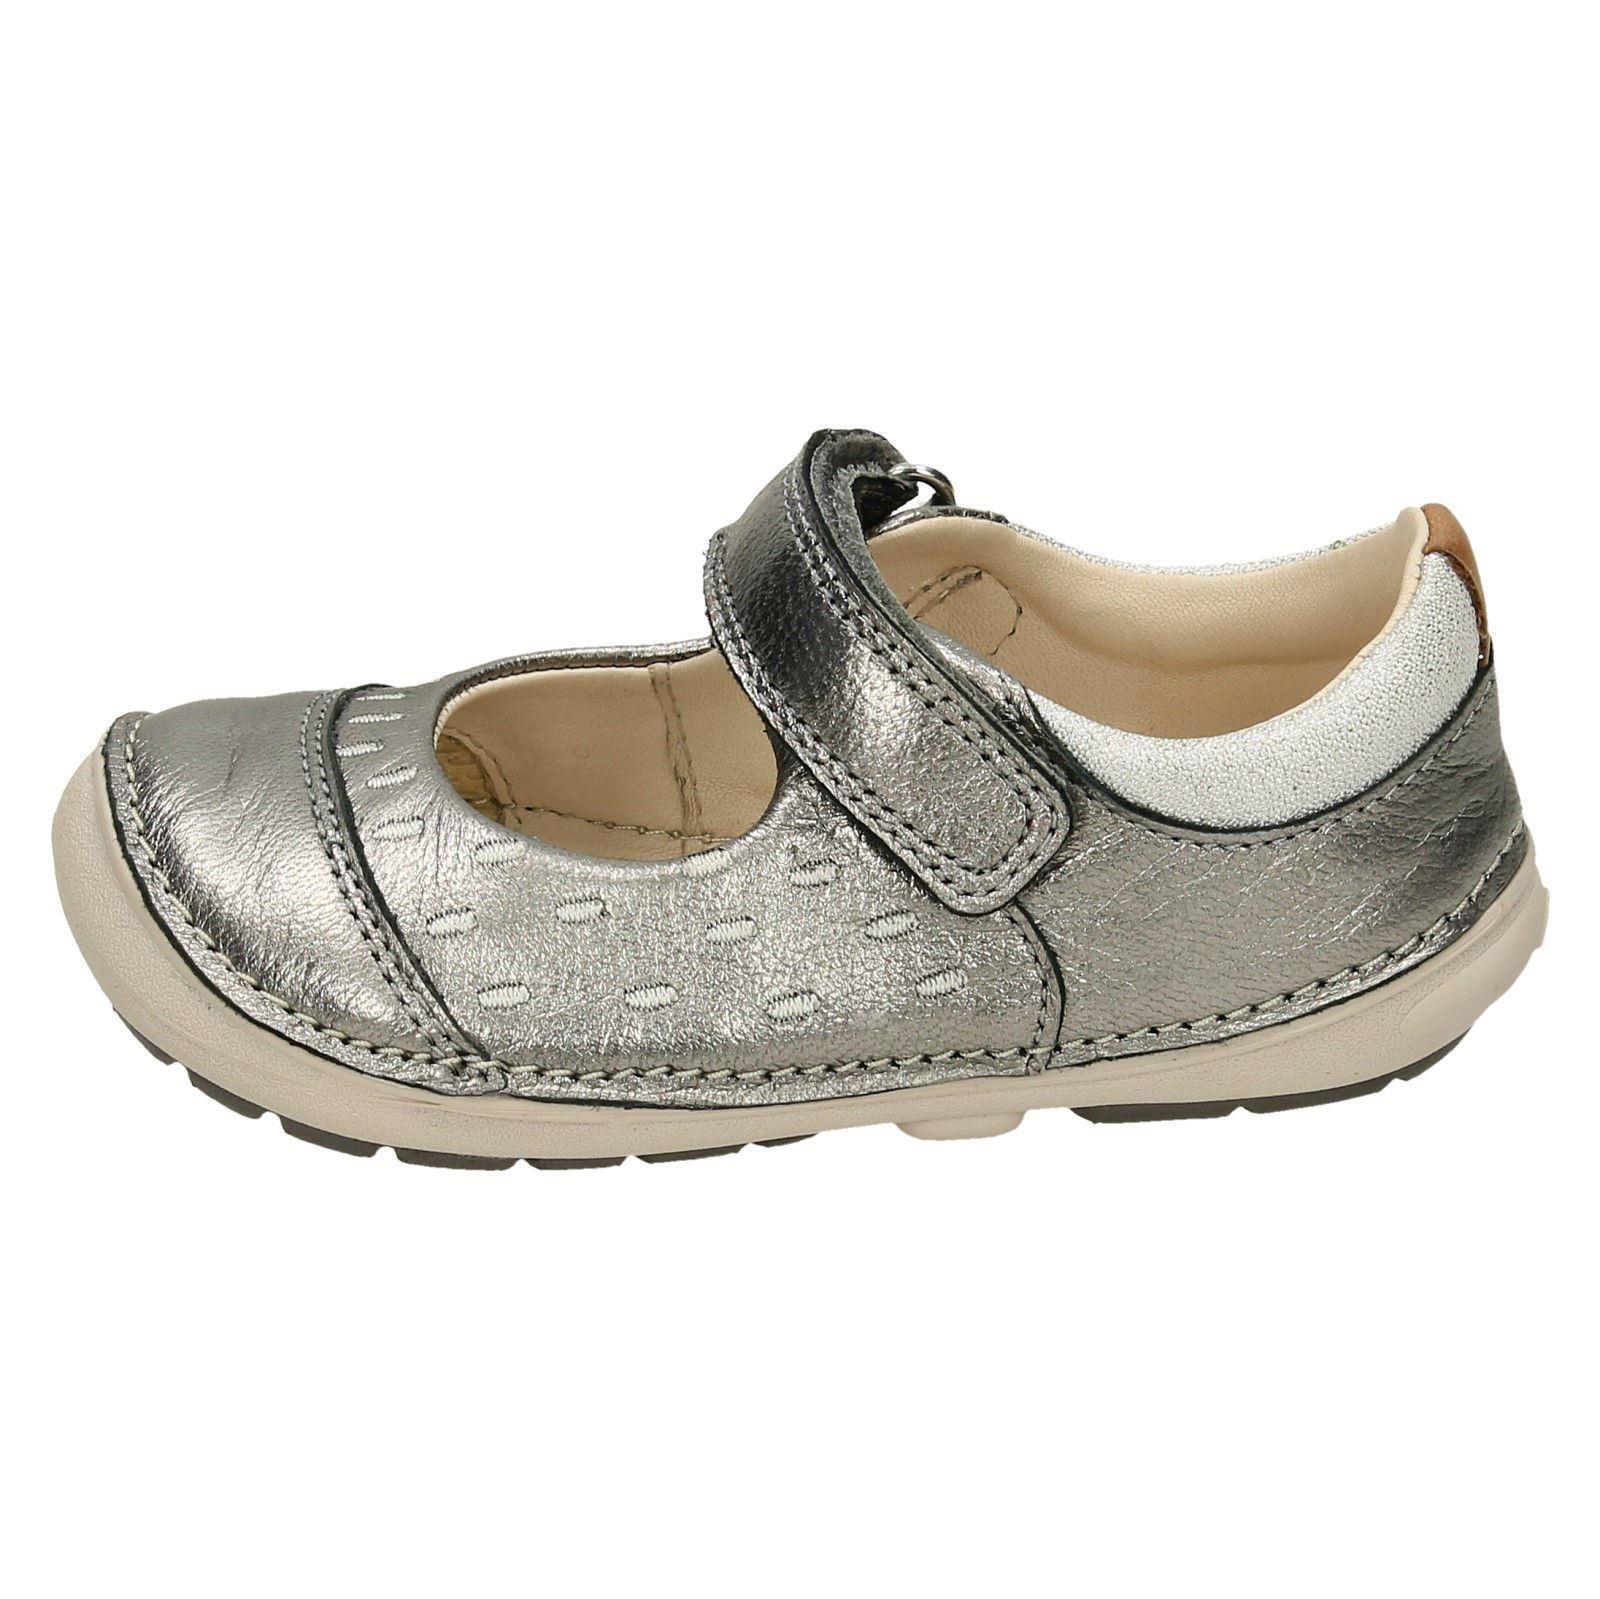 Niña Softly Clarks Lou Zapatos Informal Primeros Calzado HSH8gwqxr